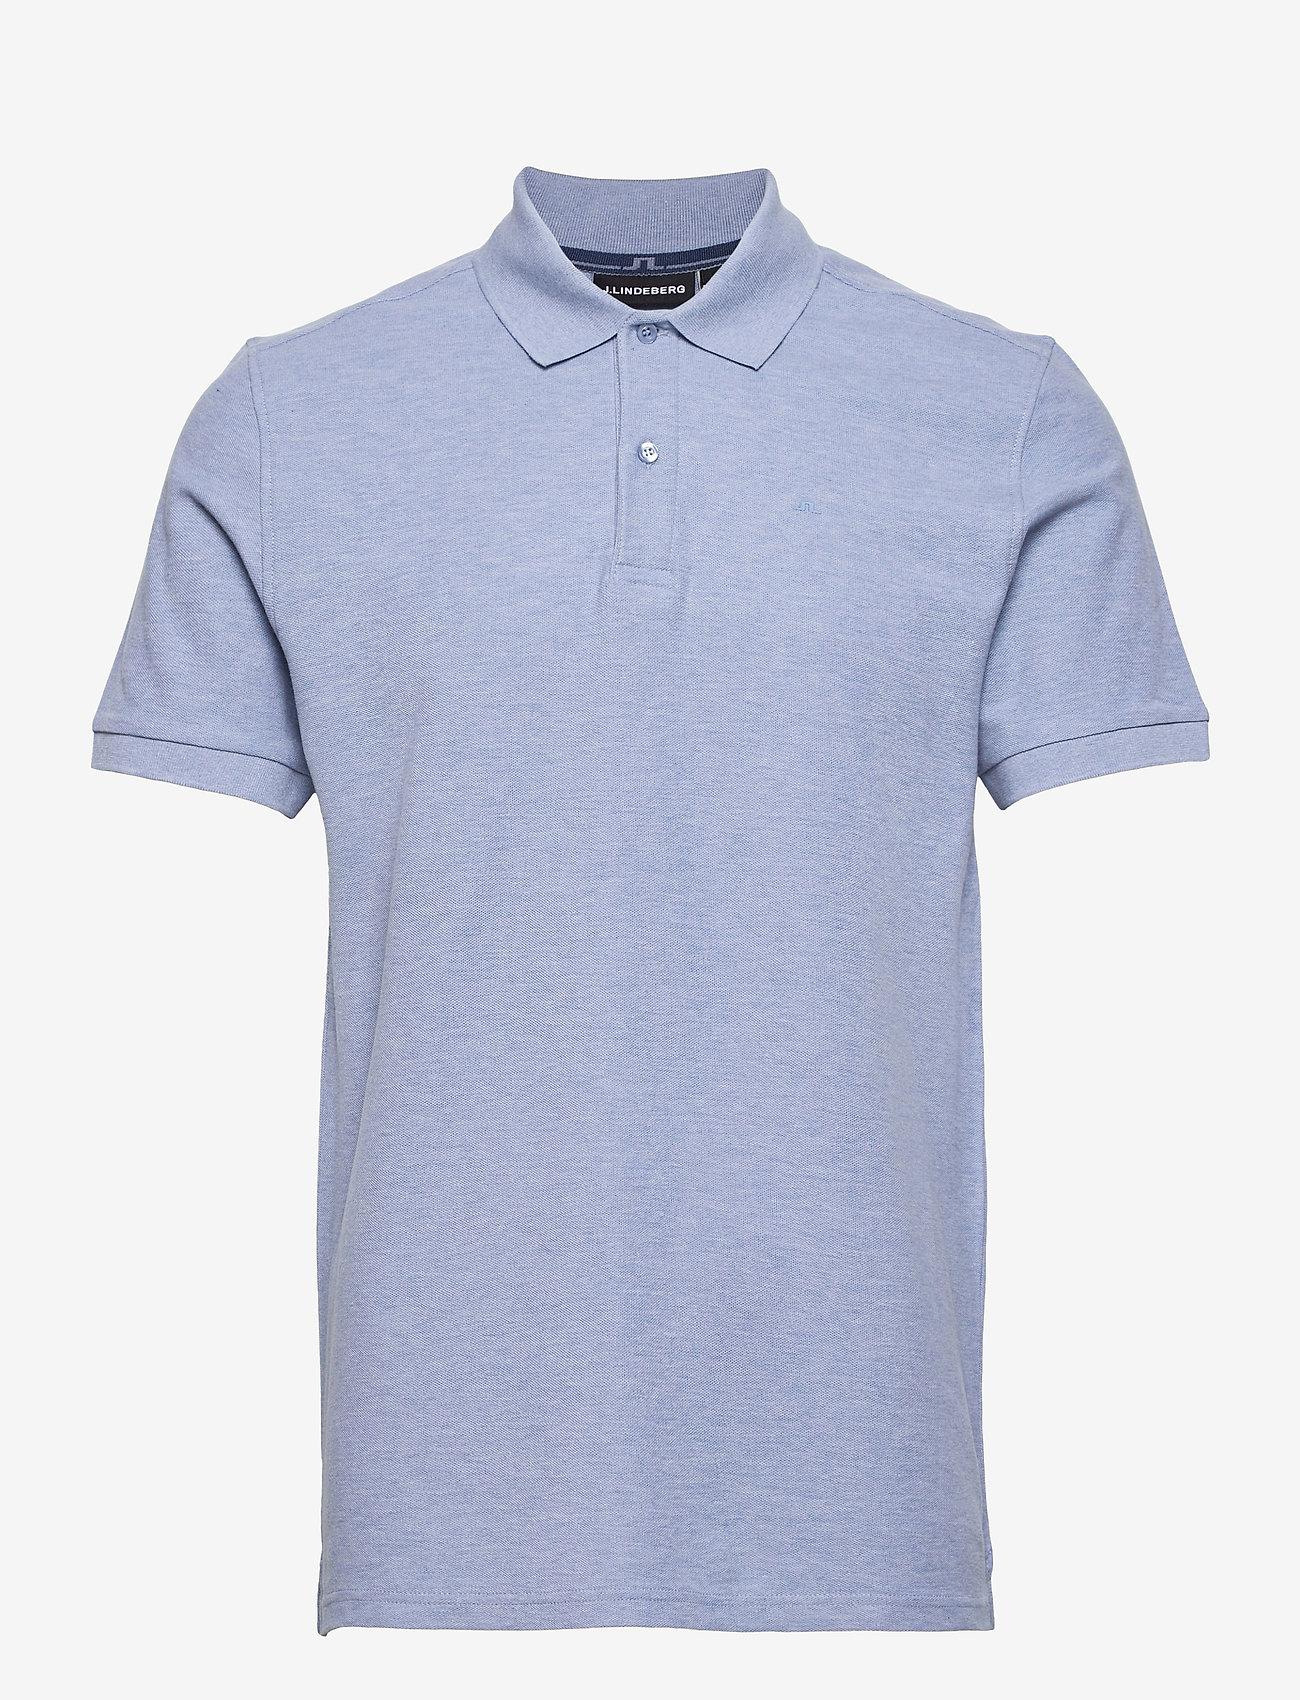 J. Lindeberg - Troy Polo Shirt Seasonal Pique - kurzärmelig - spring blue melange - 1